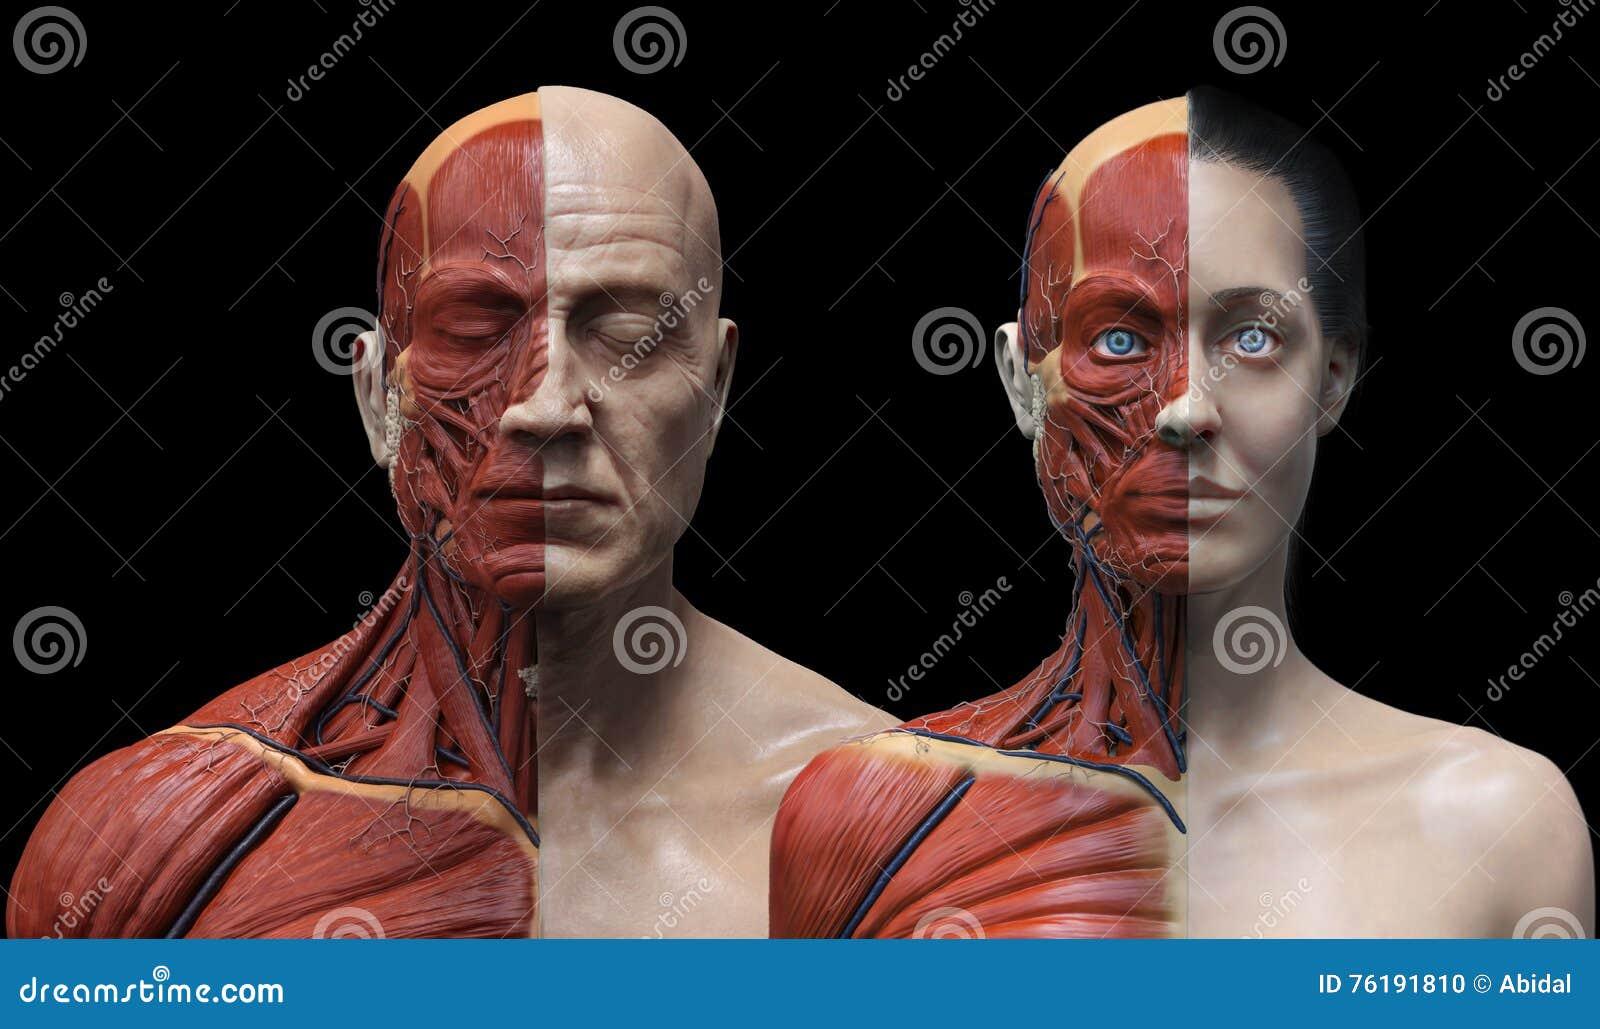 Human Body Anatomy Male And Female Stock Illustration Illustration